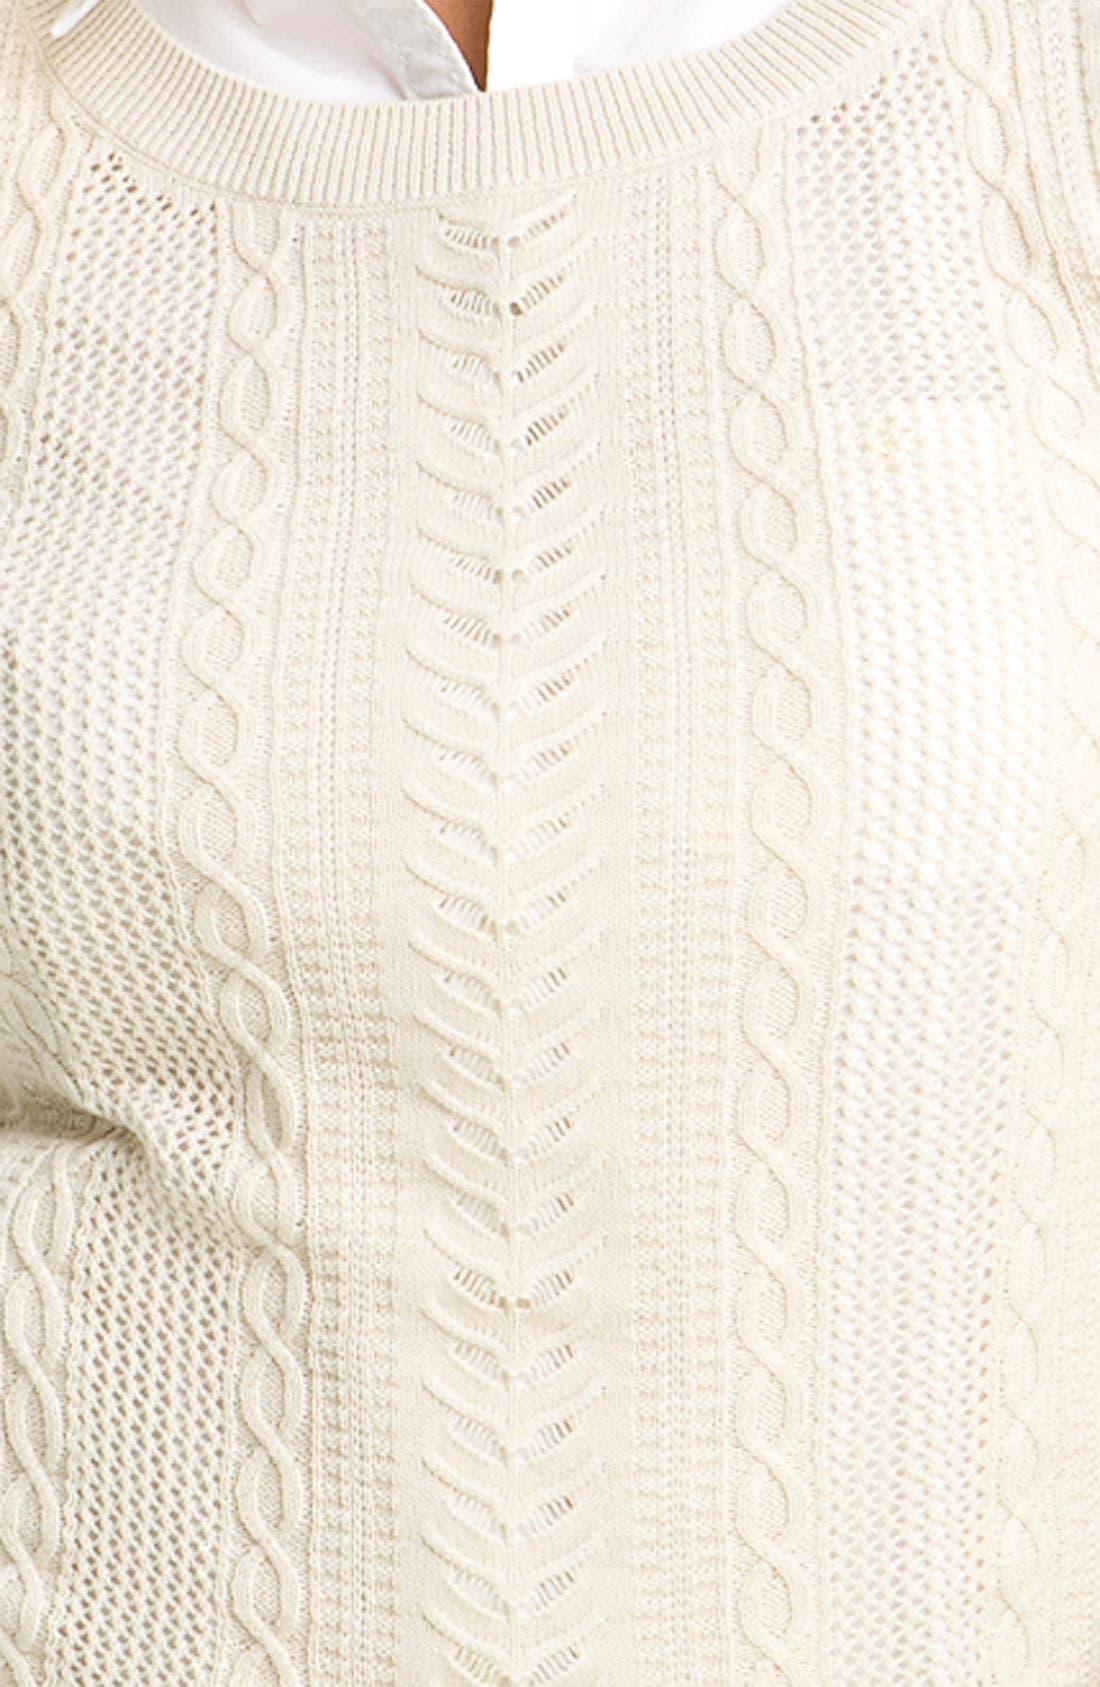 Alternate Image 3  - BP. Sheer Cable Knit Sweater (Juniors)